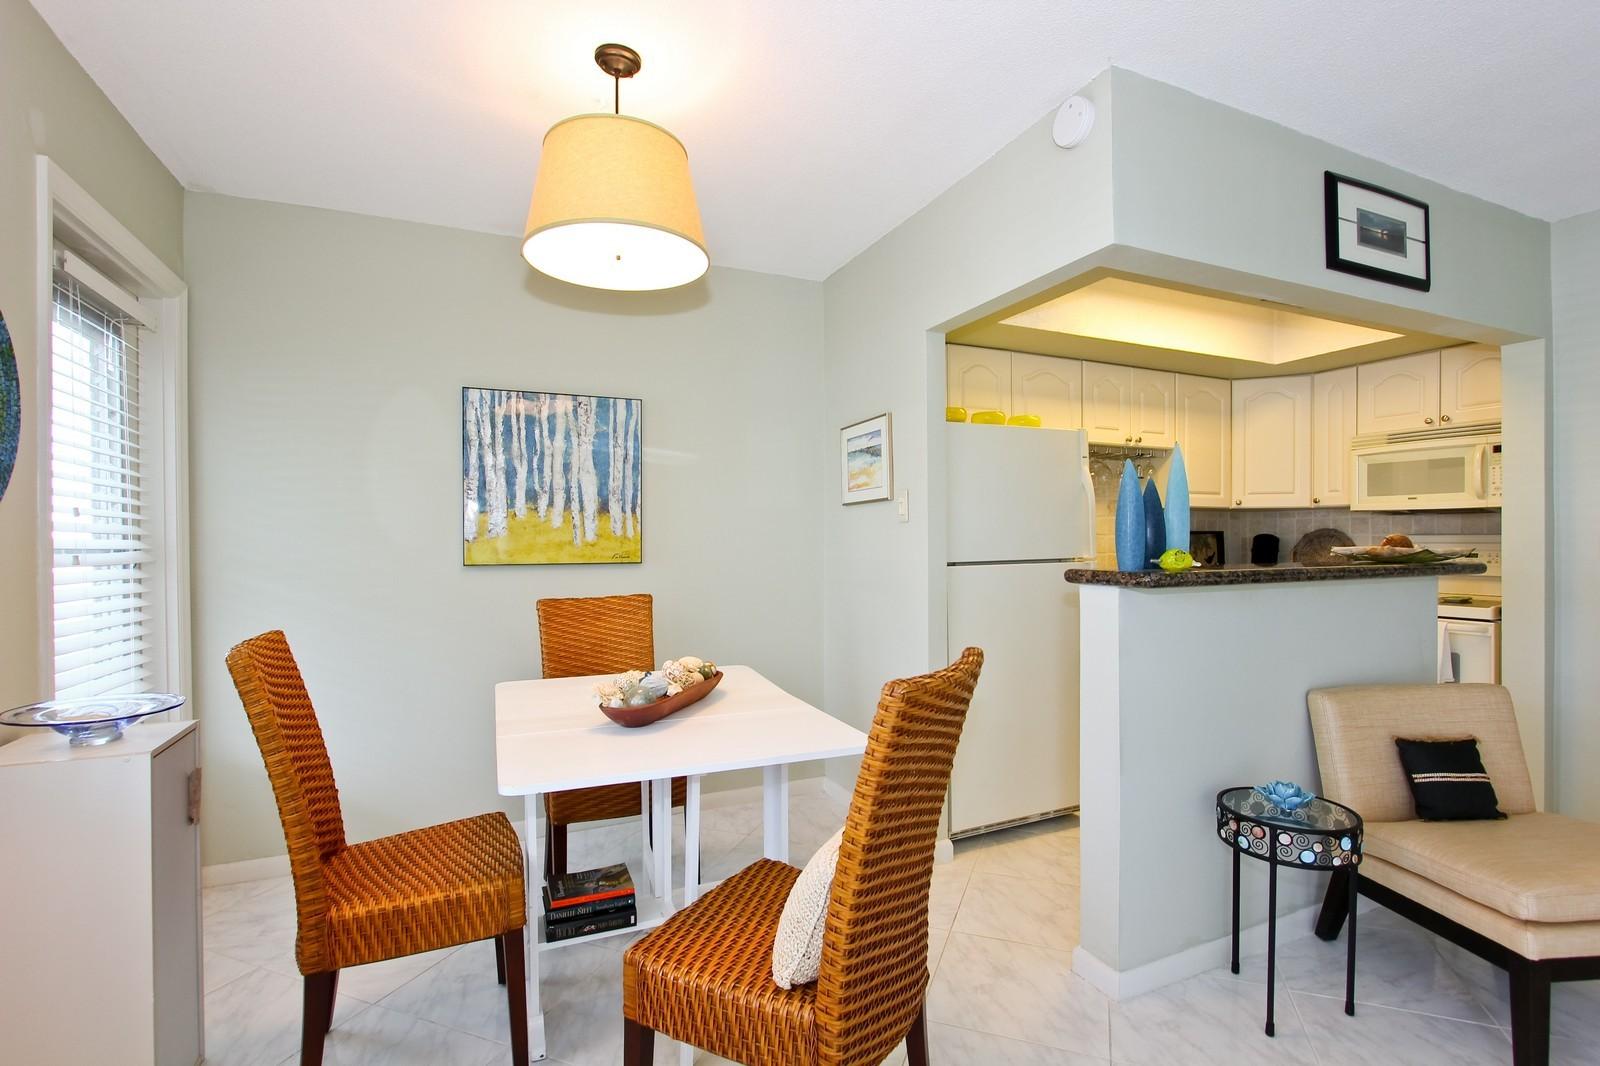 Real Estate Photography - 5505 N Ocean Blvd, 4-203, Ocean Ridge, FL, 33435 - Kitchen / Dining Room